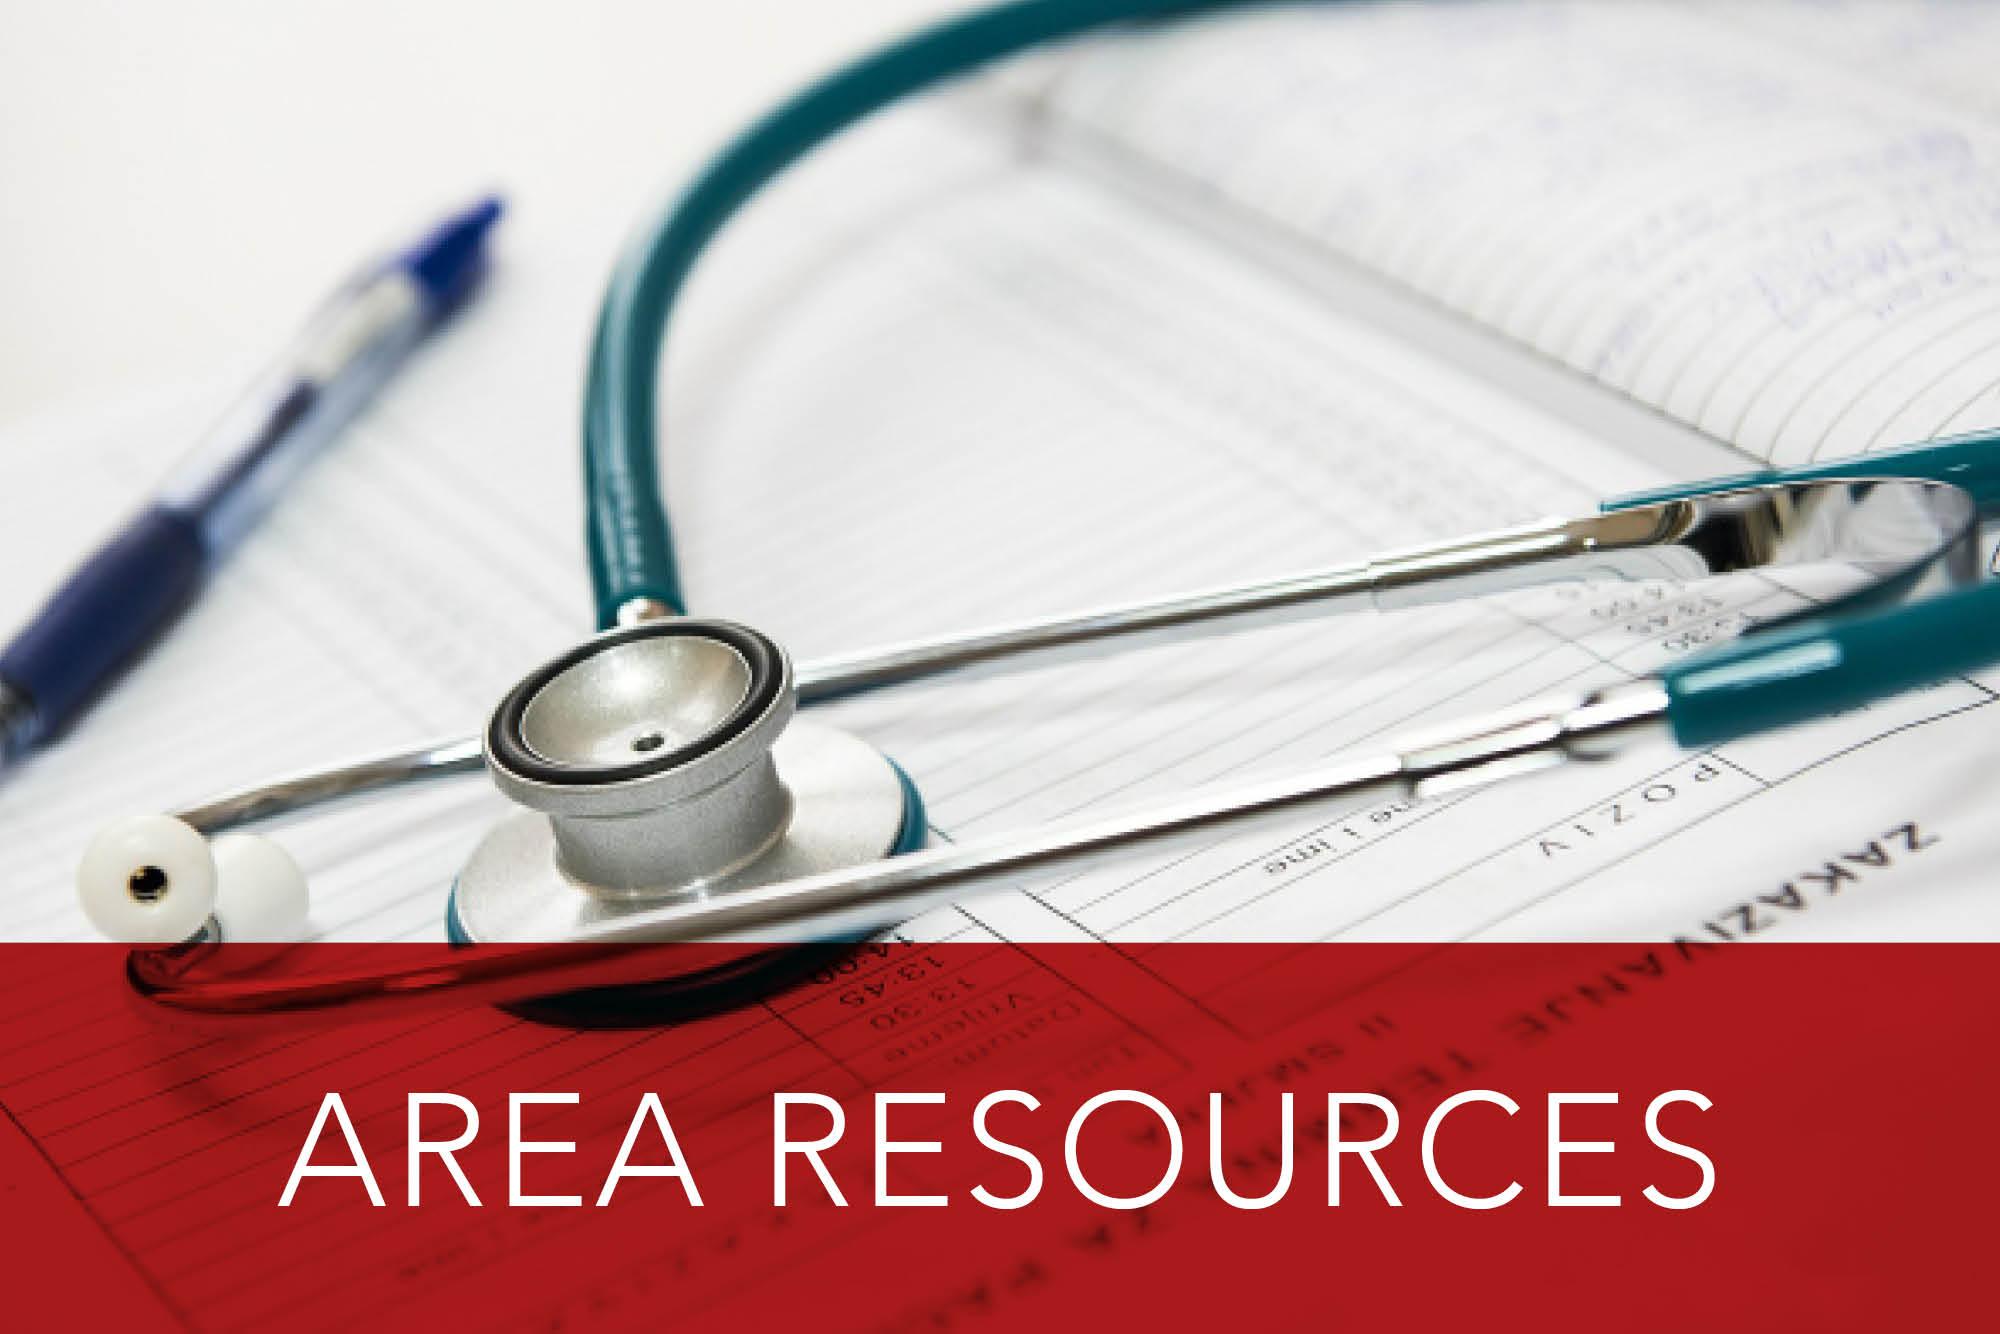 Area Resources.jpg